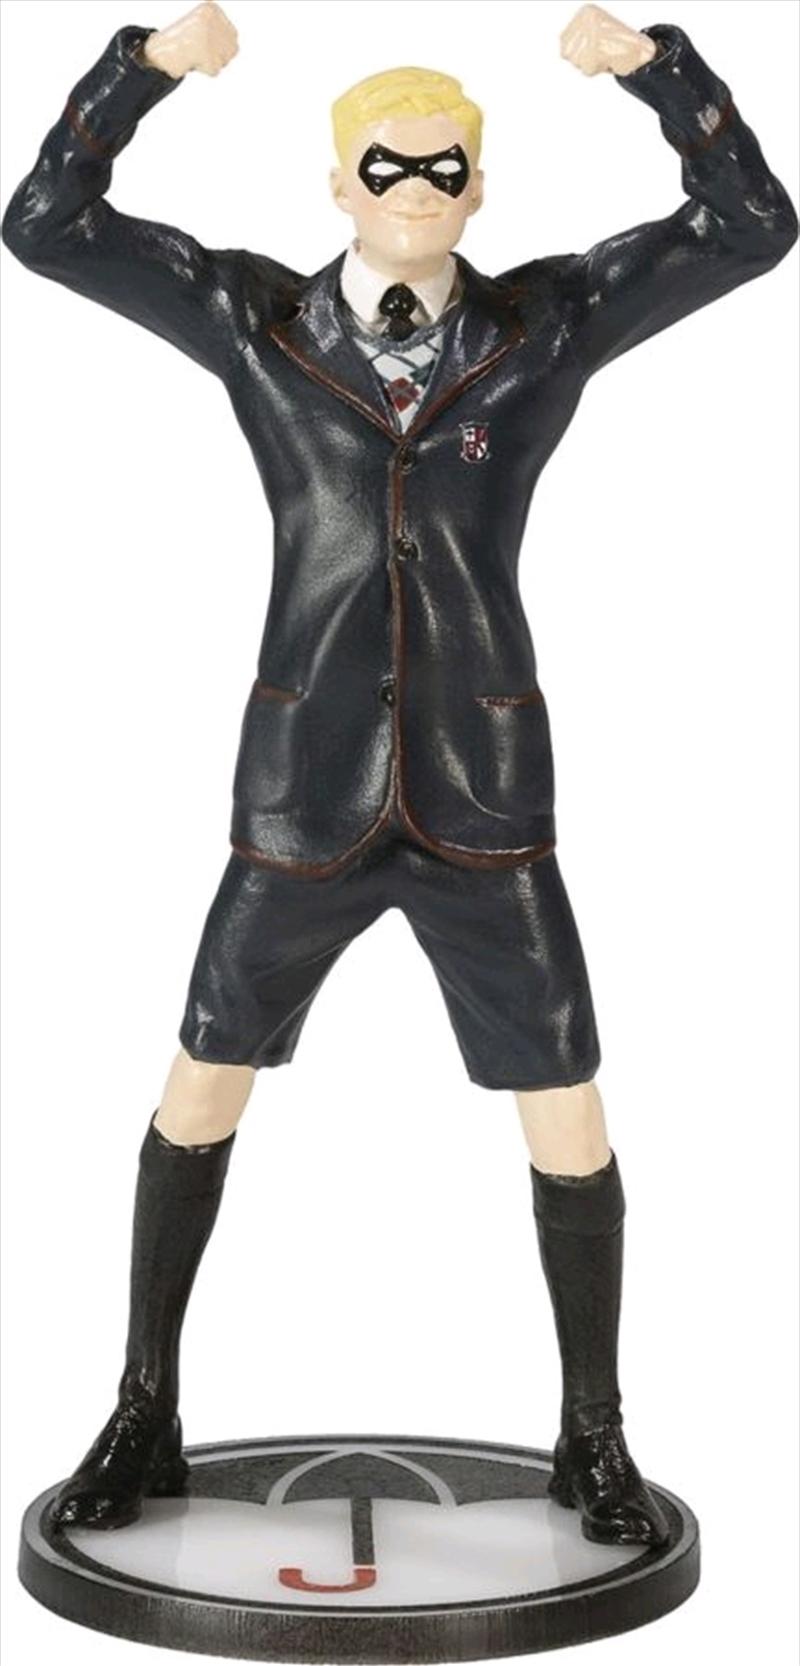 Umbrella Academy - #1 Luthor Figure Replica | Merchandise